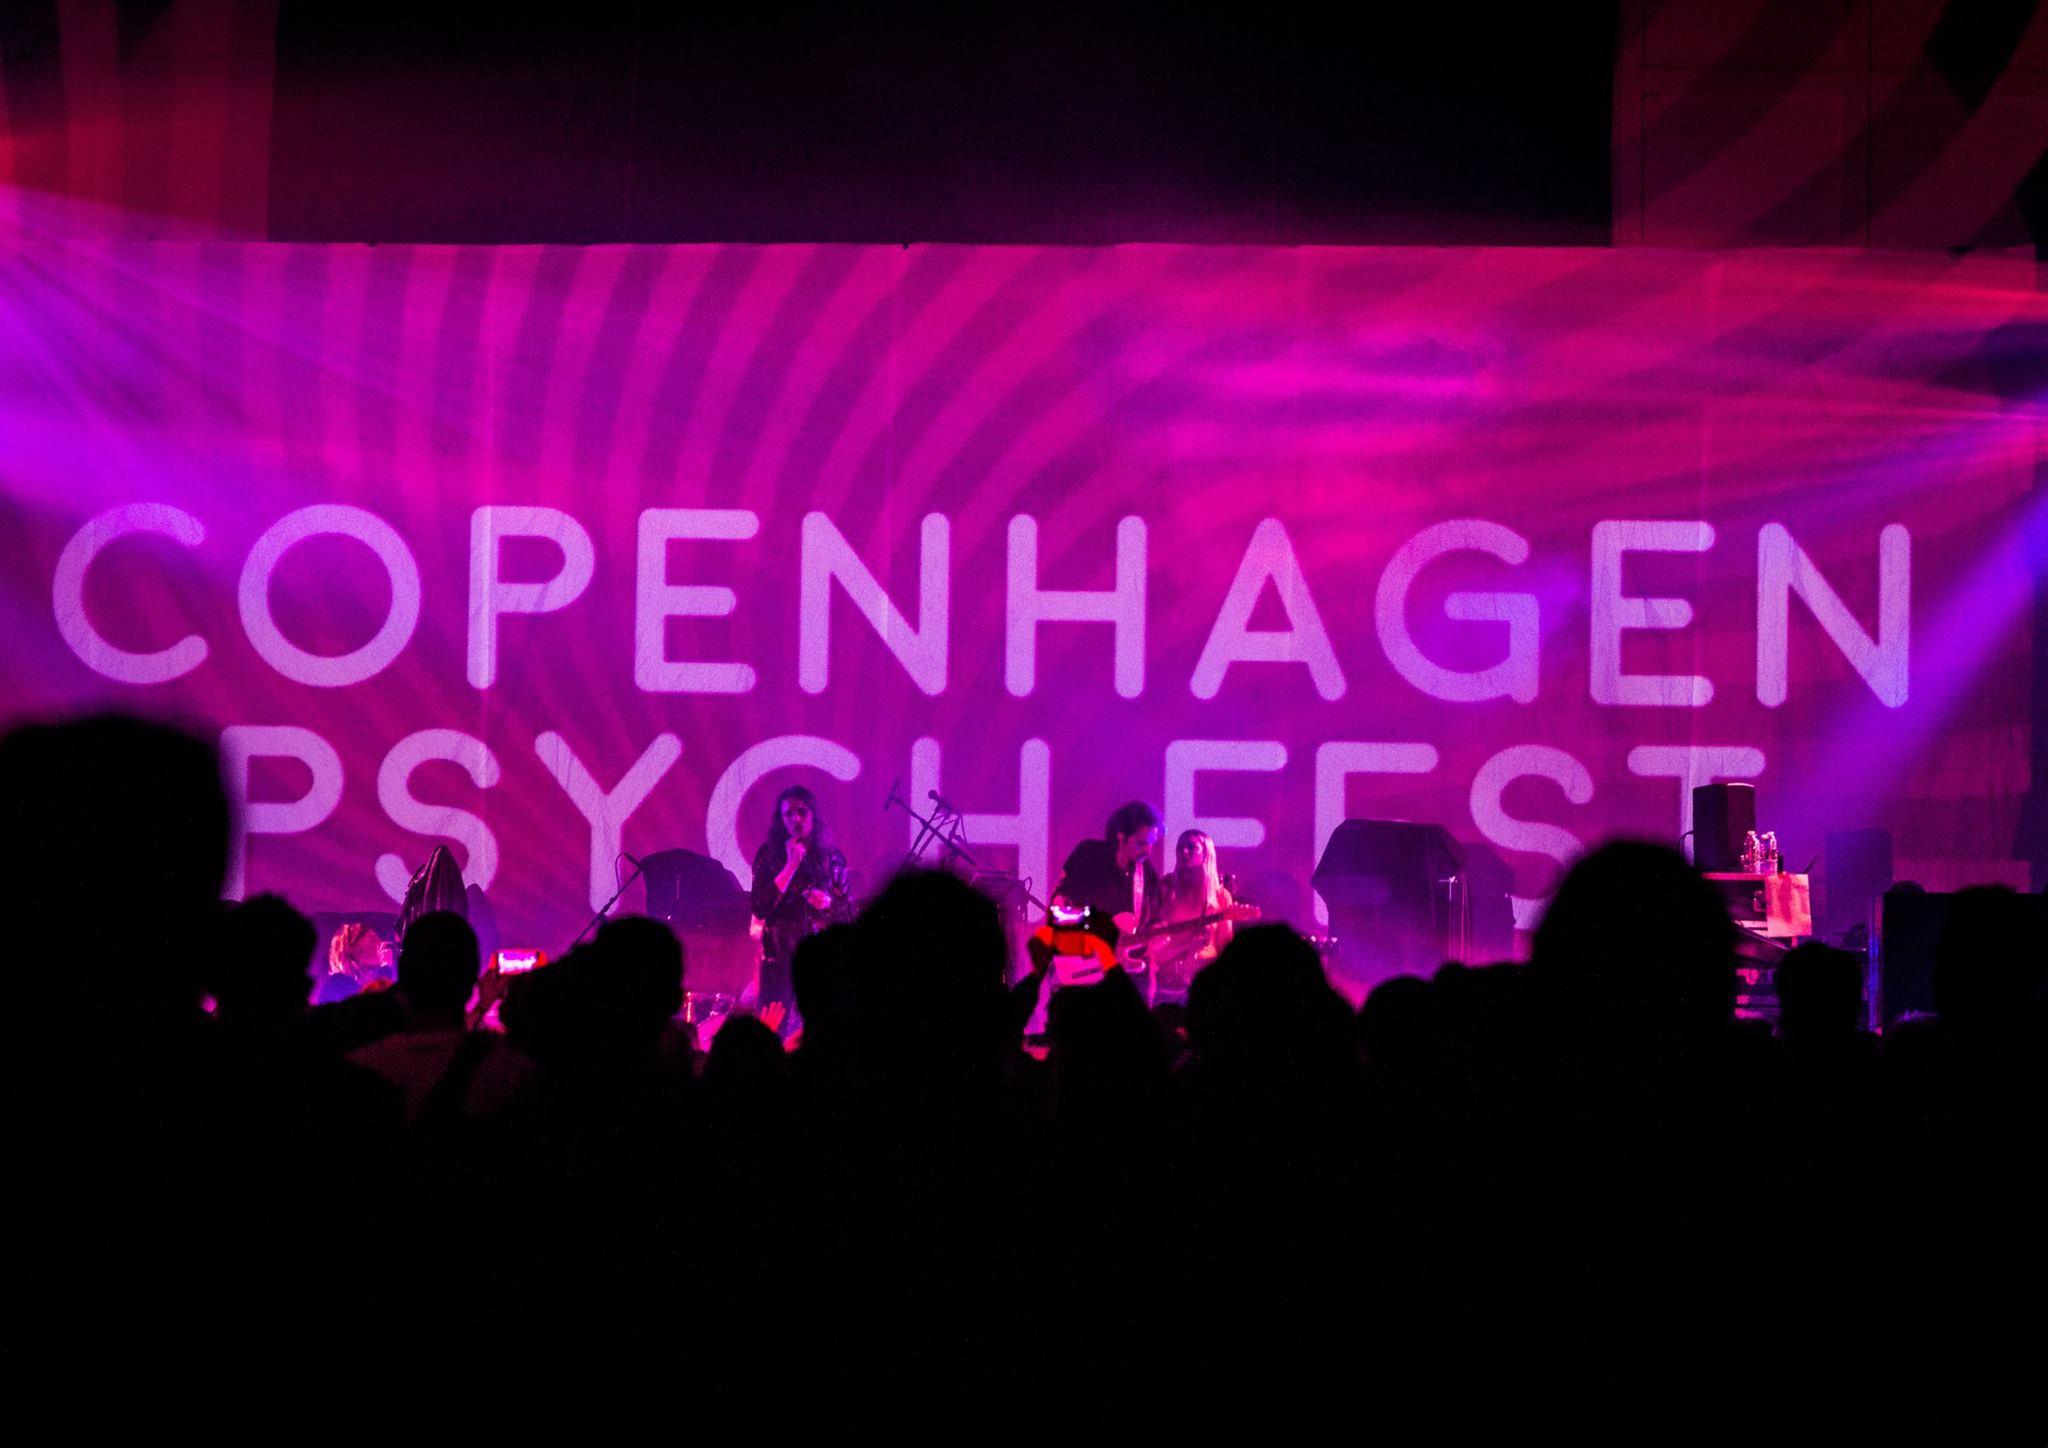 Copenhagen Psych Fest billede